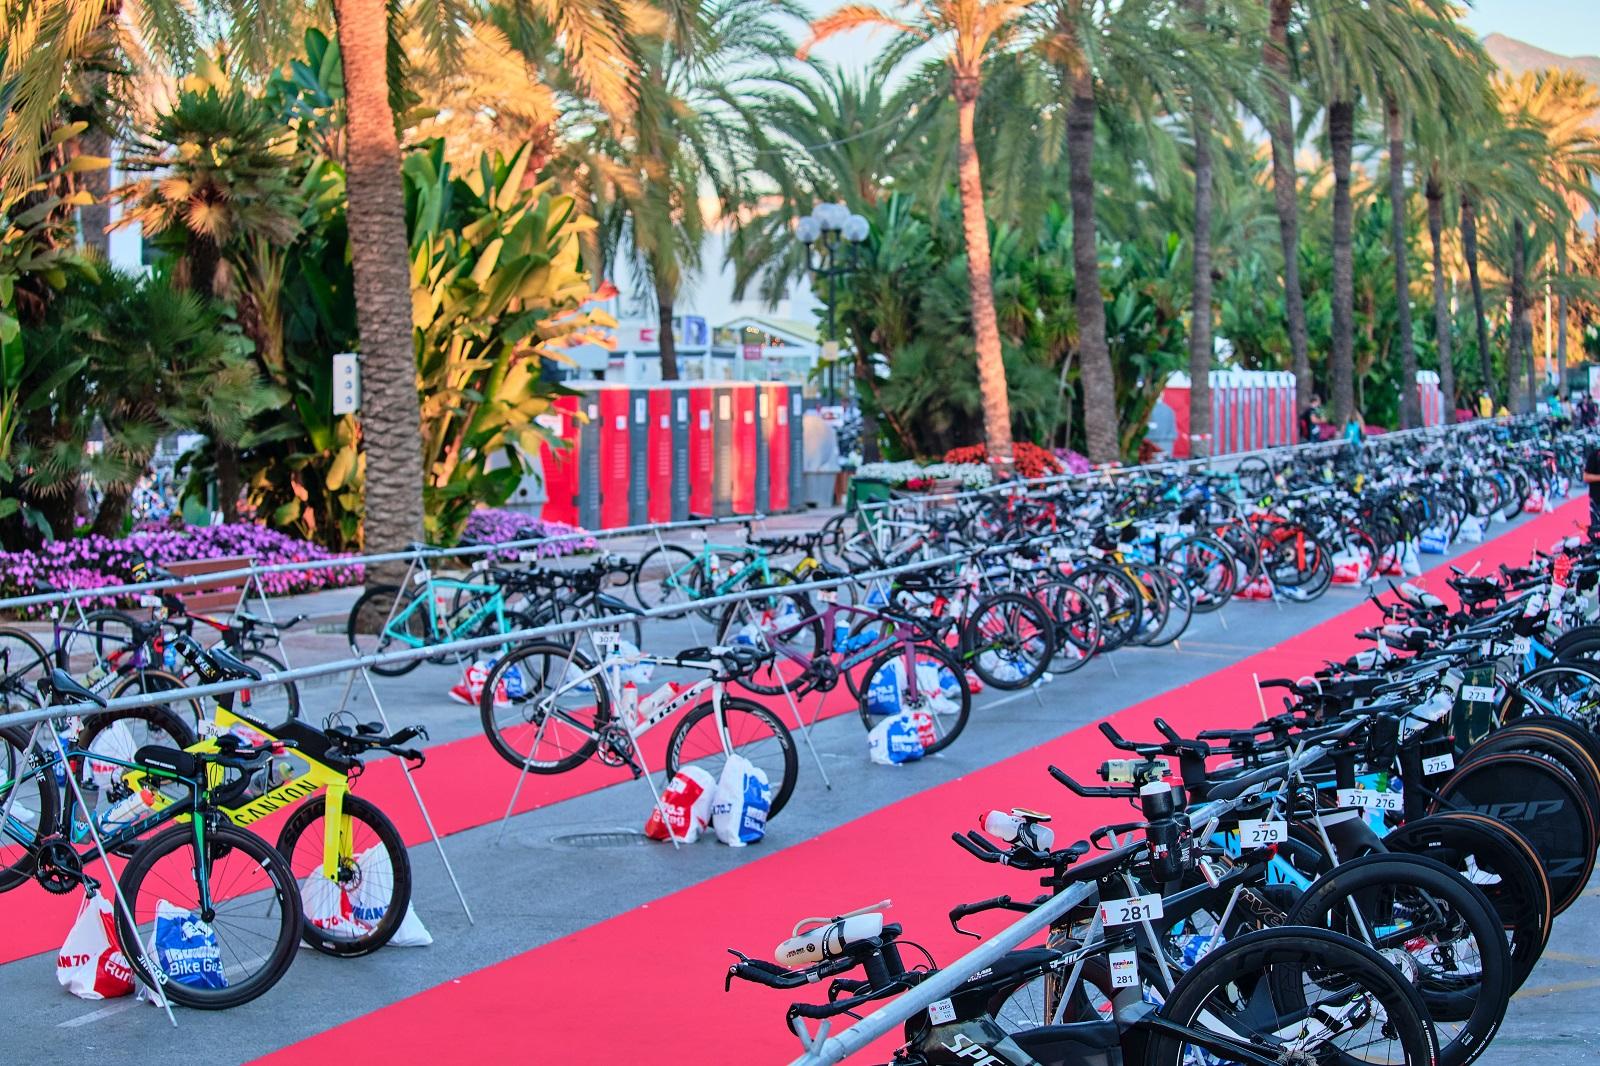 Ironman cycling area